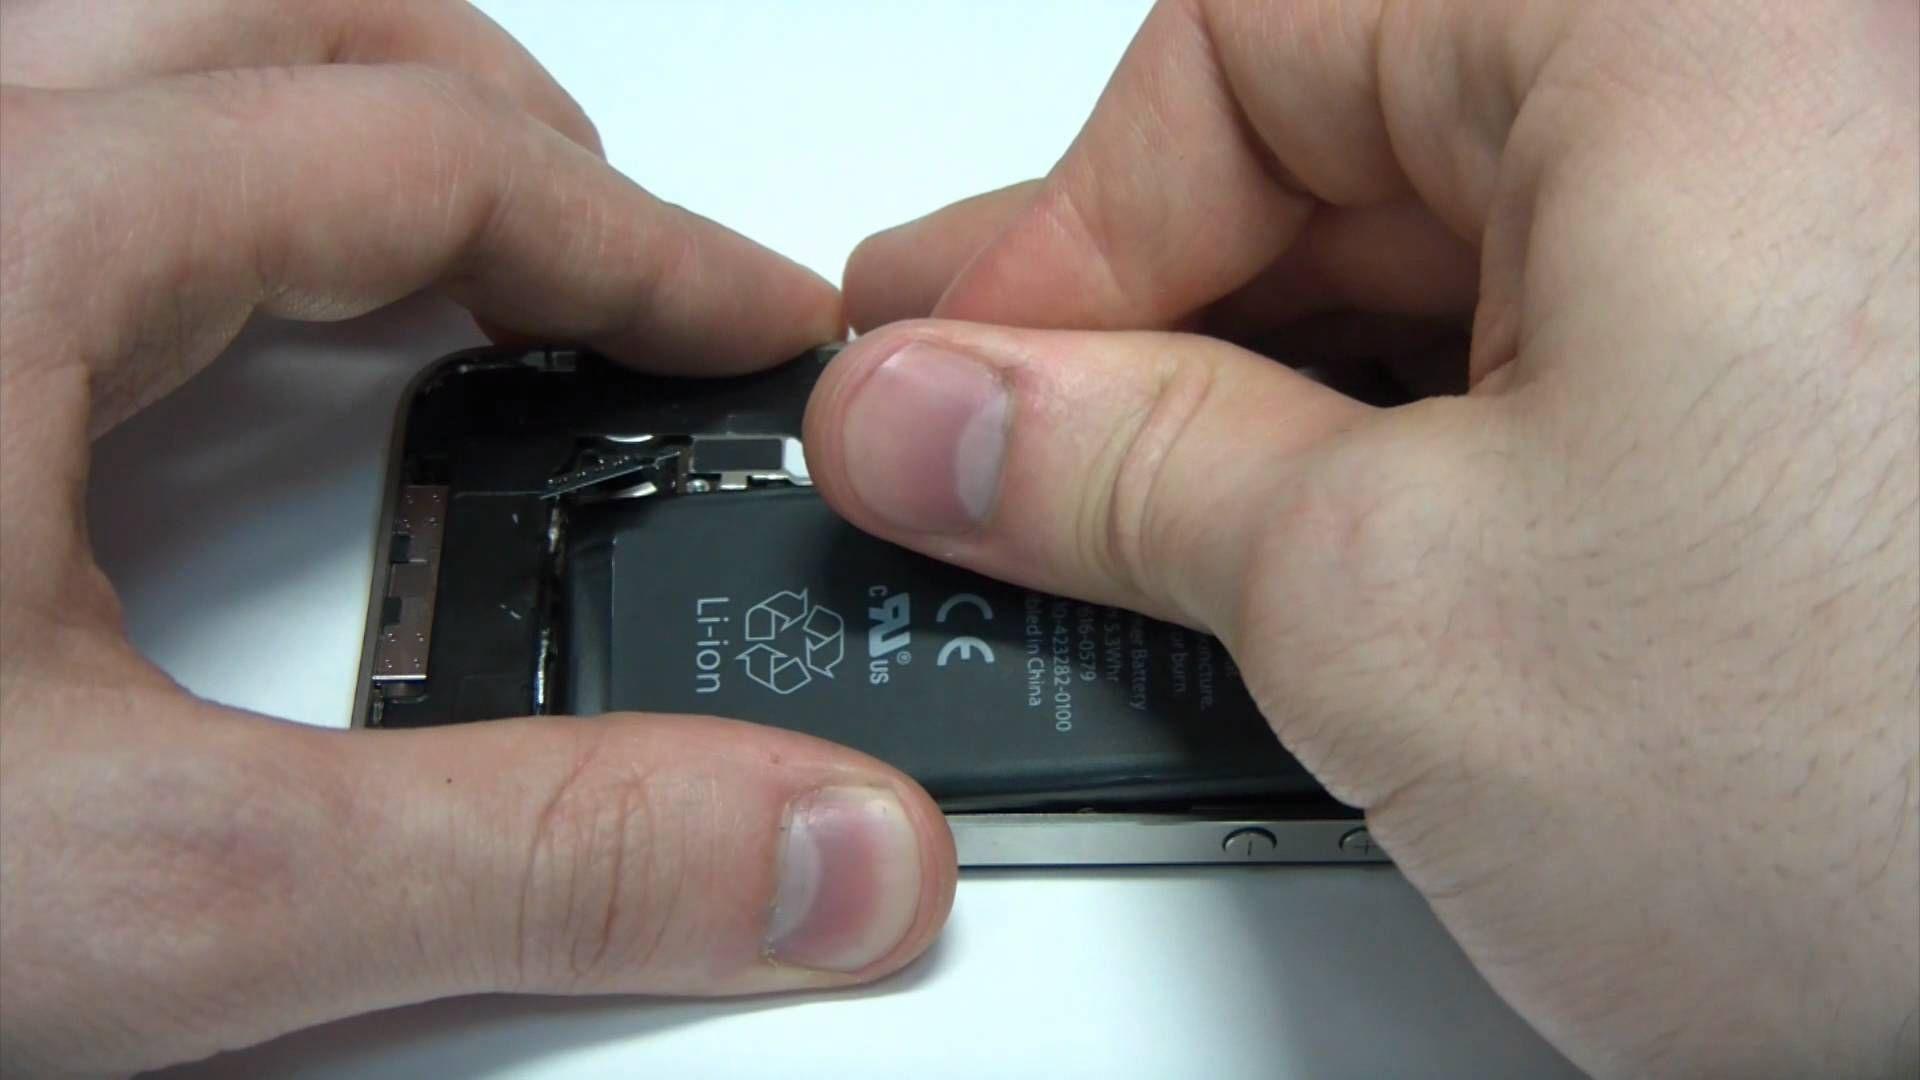 замена батарей iphone 4s видео